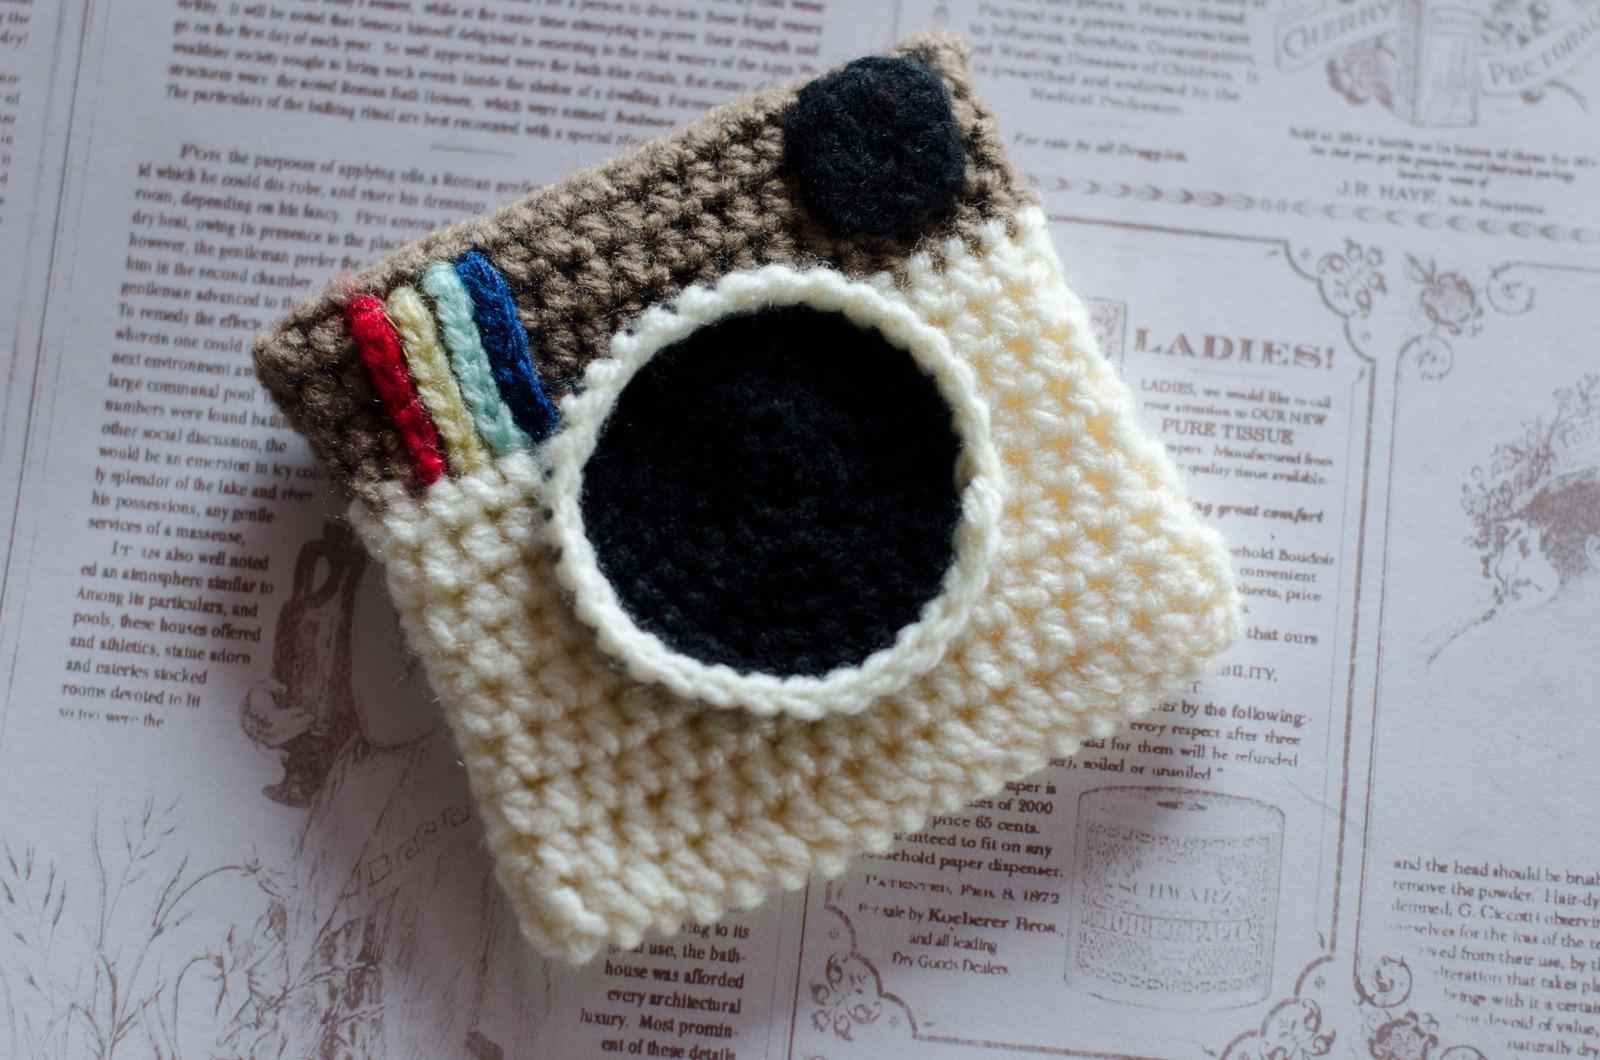 Crochet Instagram Purse 183 A Knit Or Crochet Pouch 183 Sewing